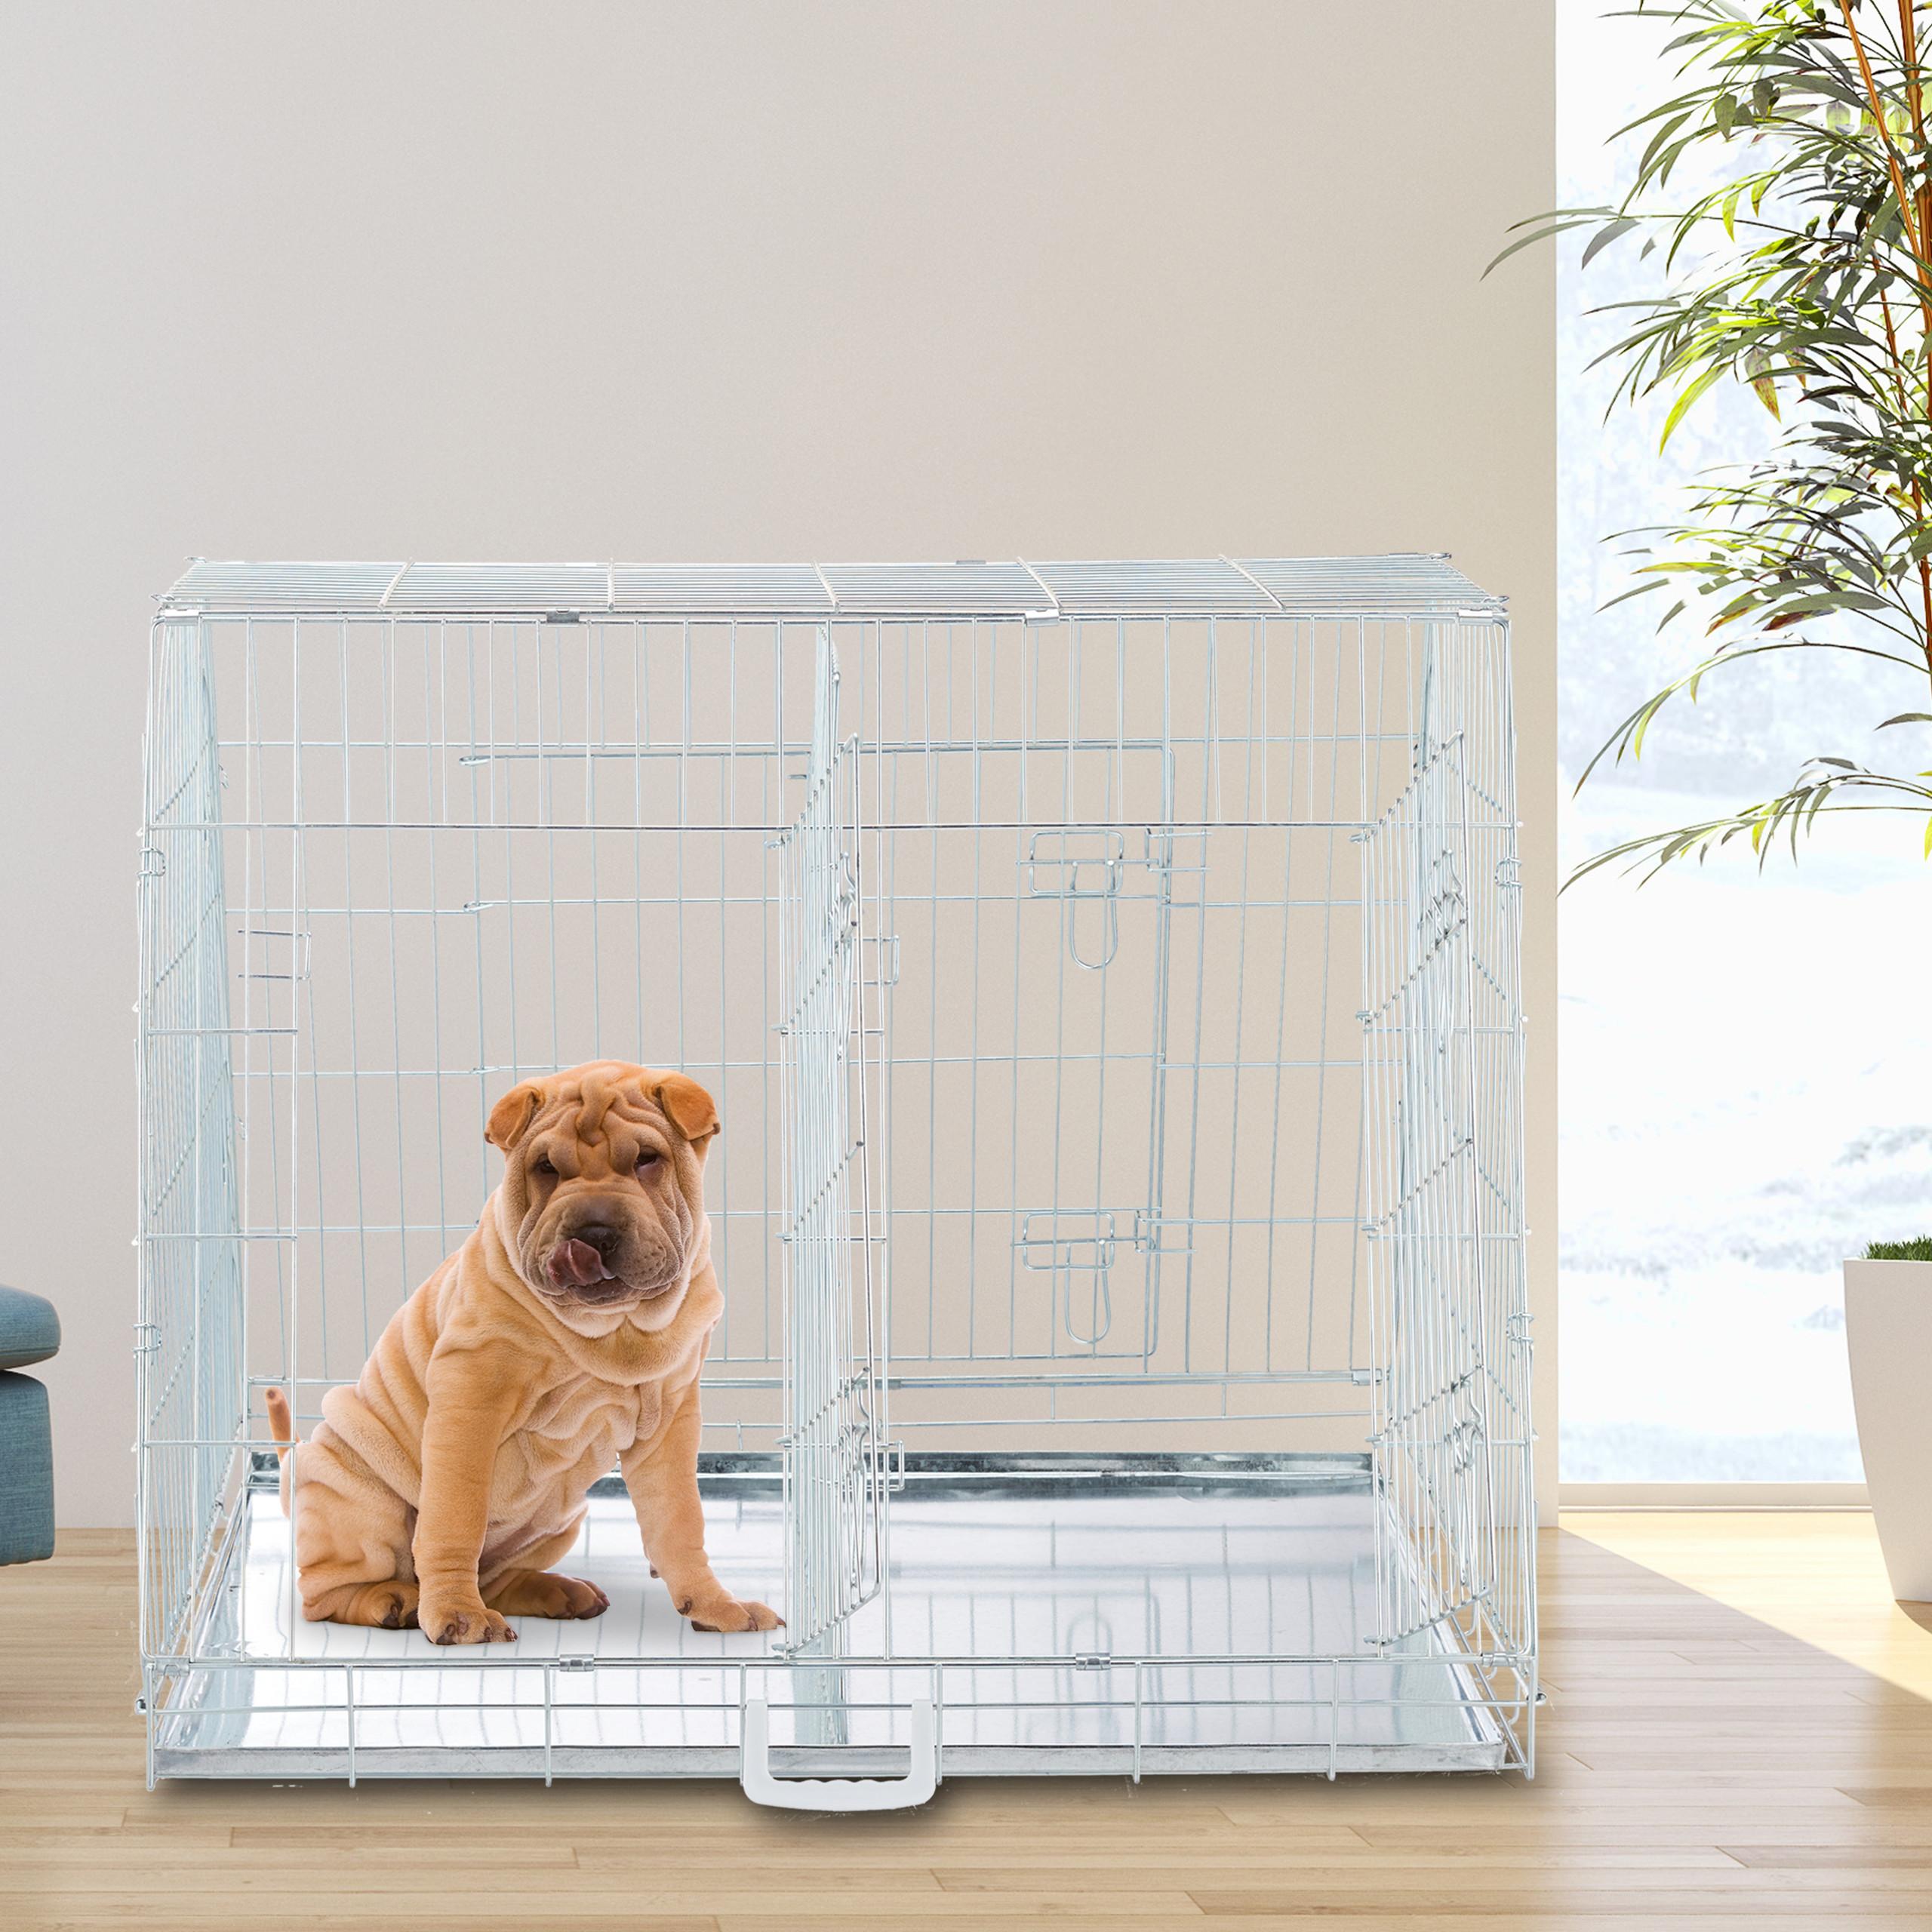 Hondenbench-dubbel-transportbench-transportbox-draadkooi-hond-L-XL-opvouwbaar miniatuur 11